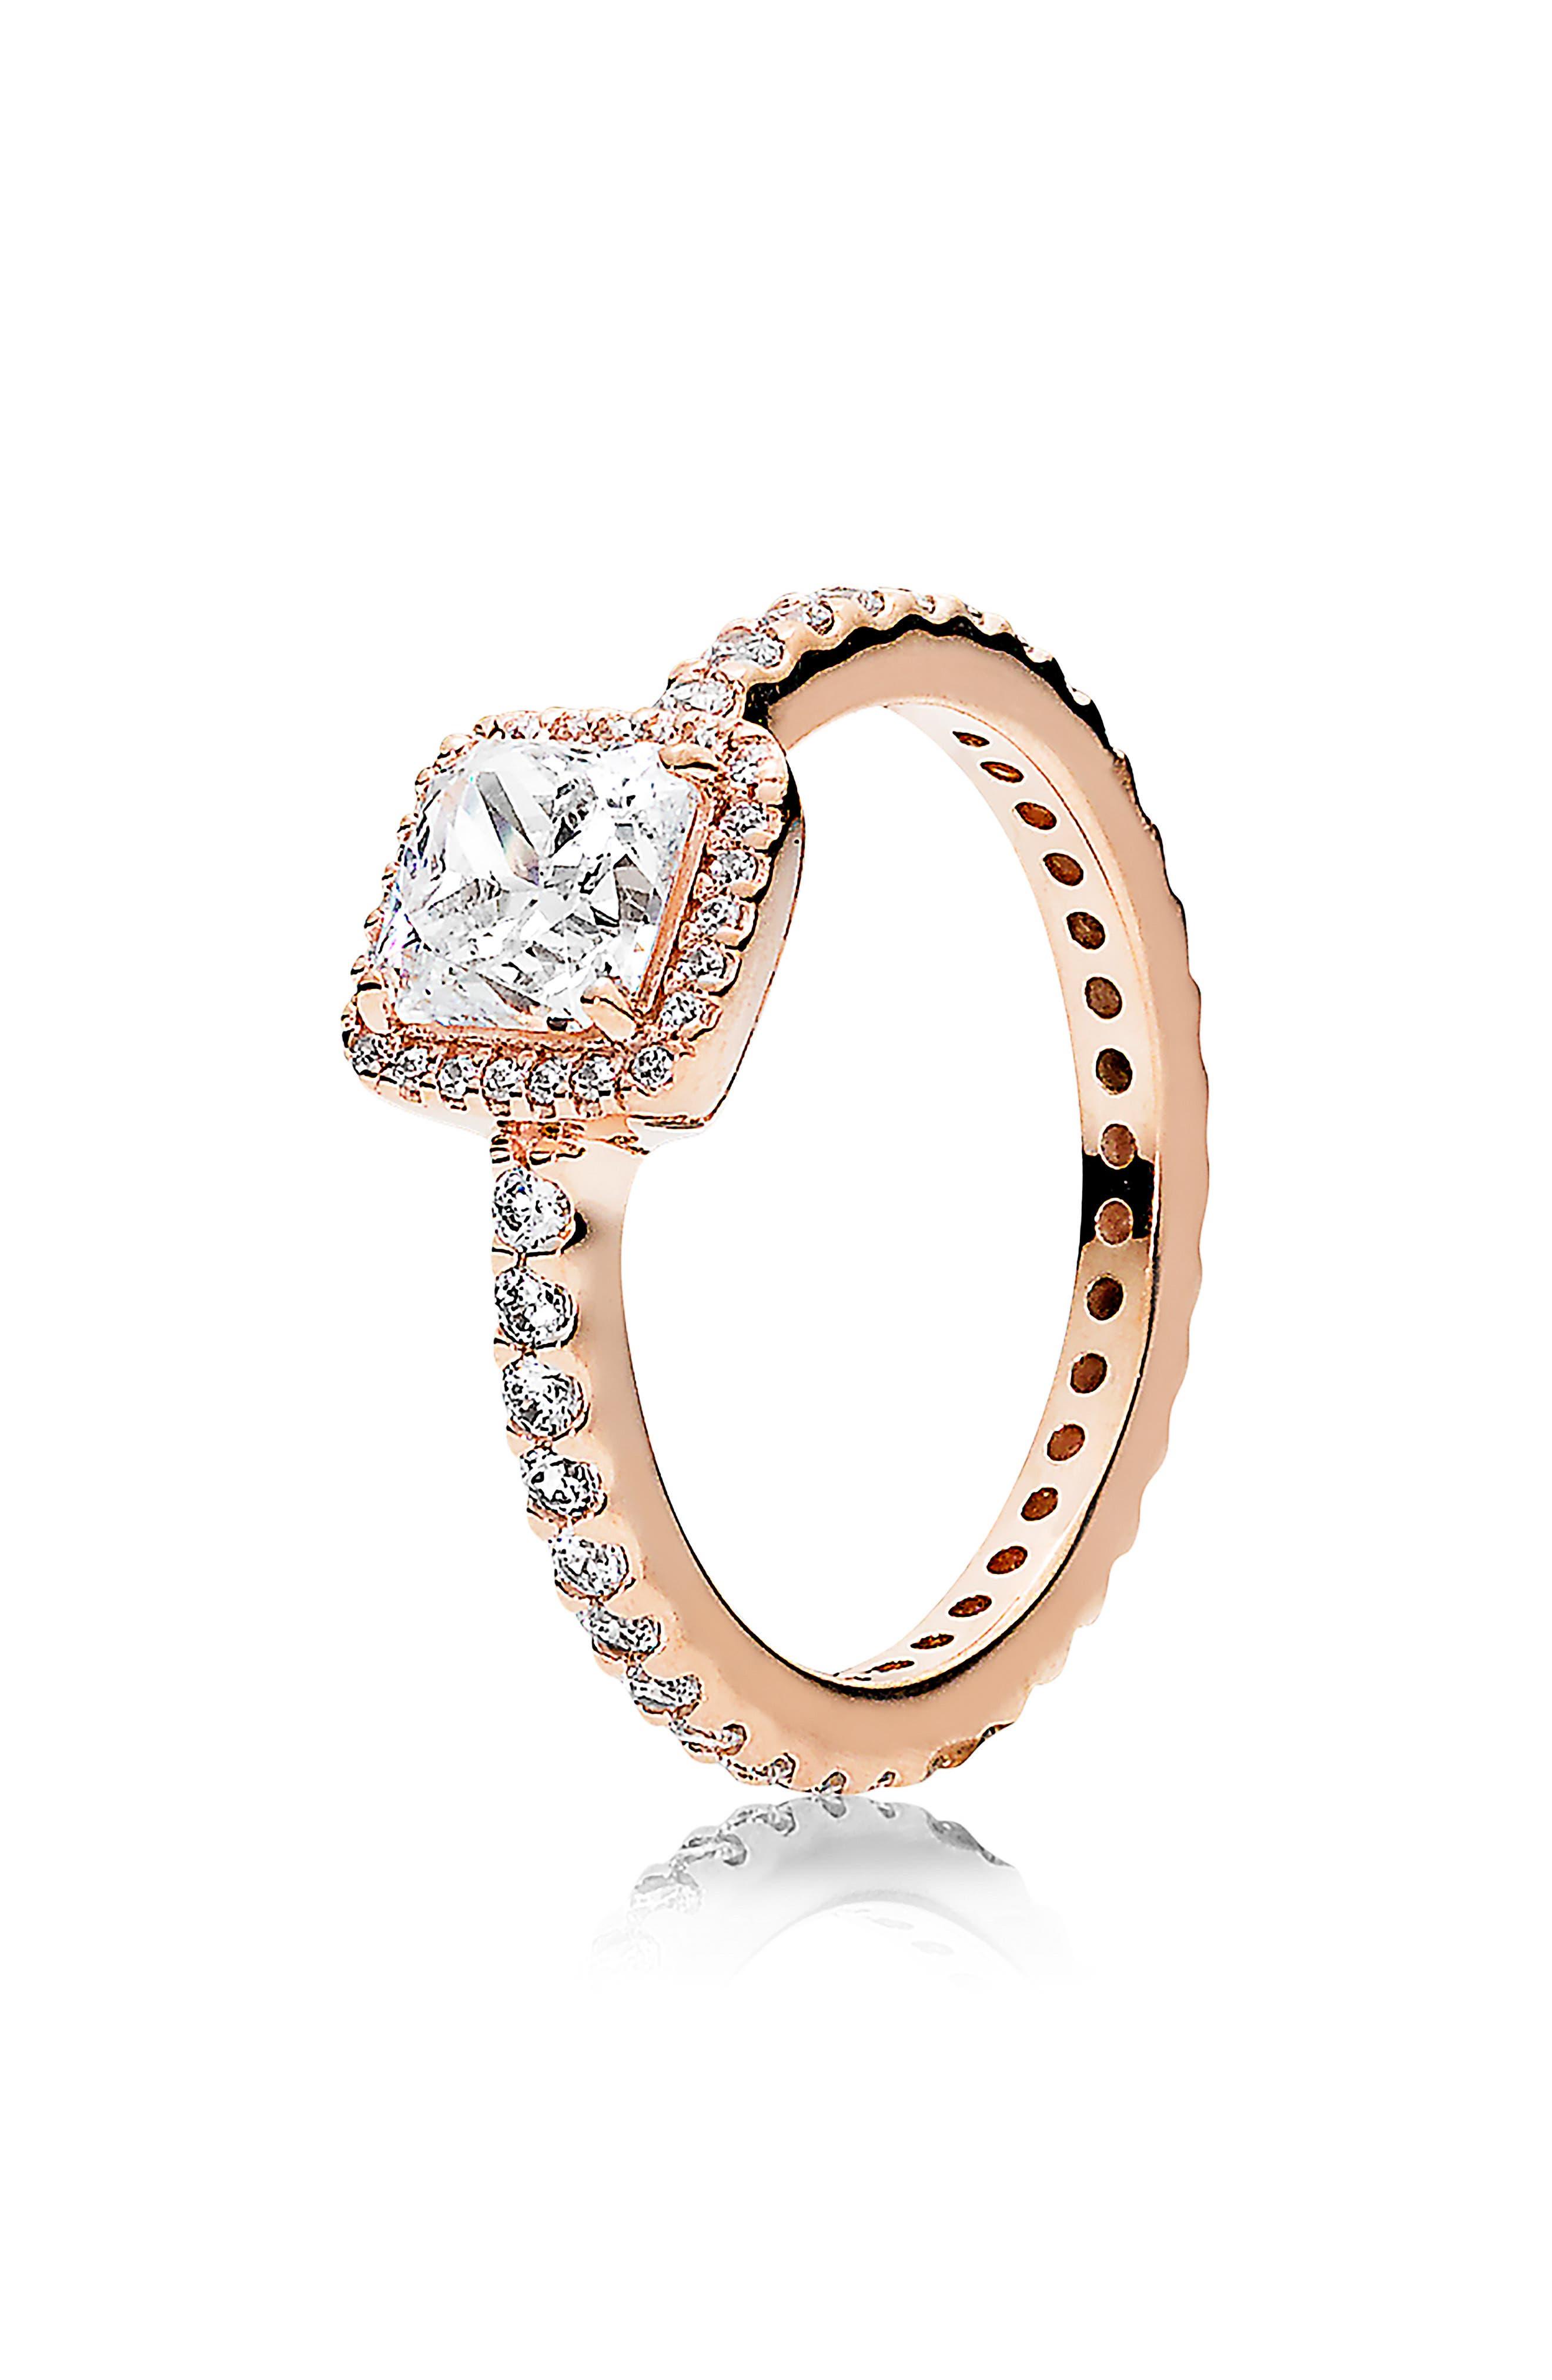 PANDORA, Timeless Elegance Ring, Main thumbnail 1, color, ROSE GOLD